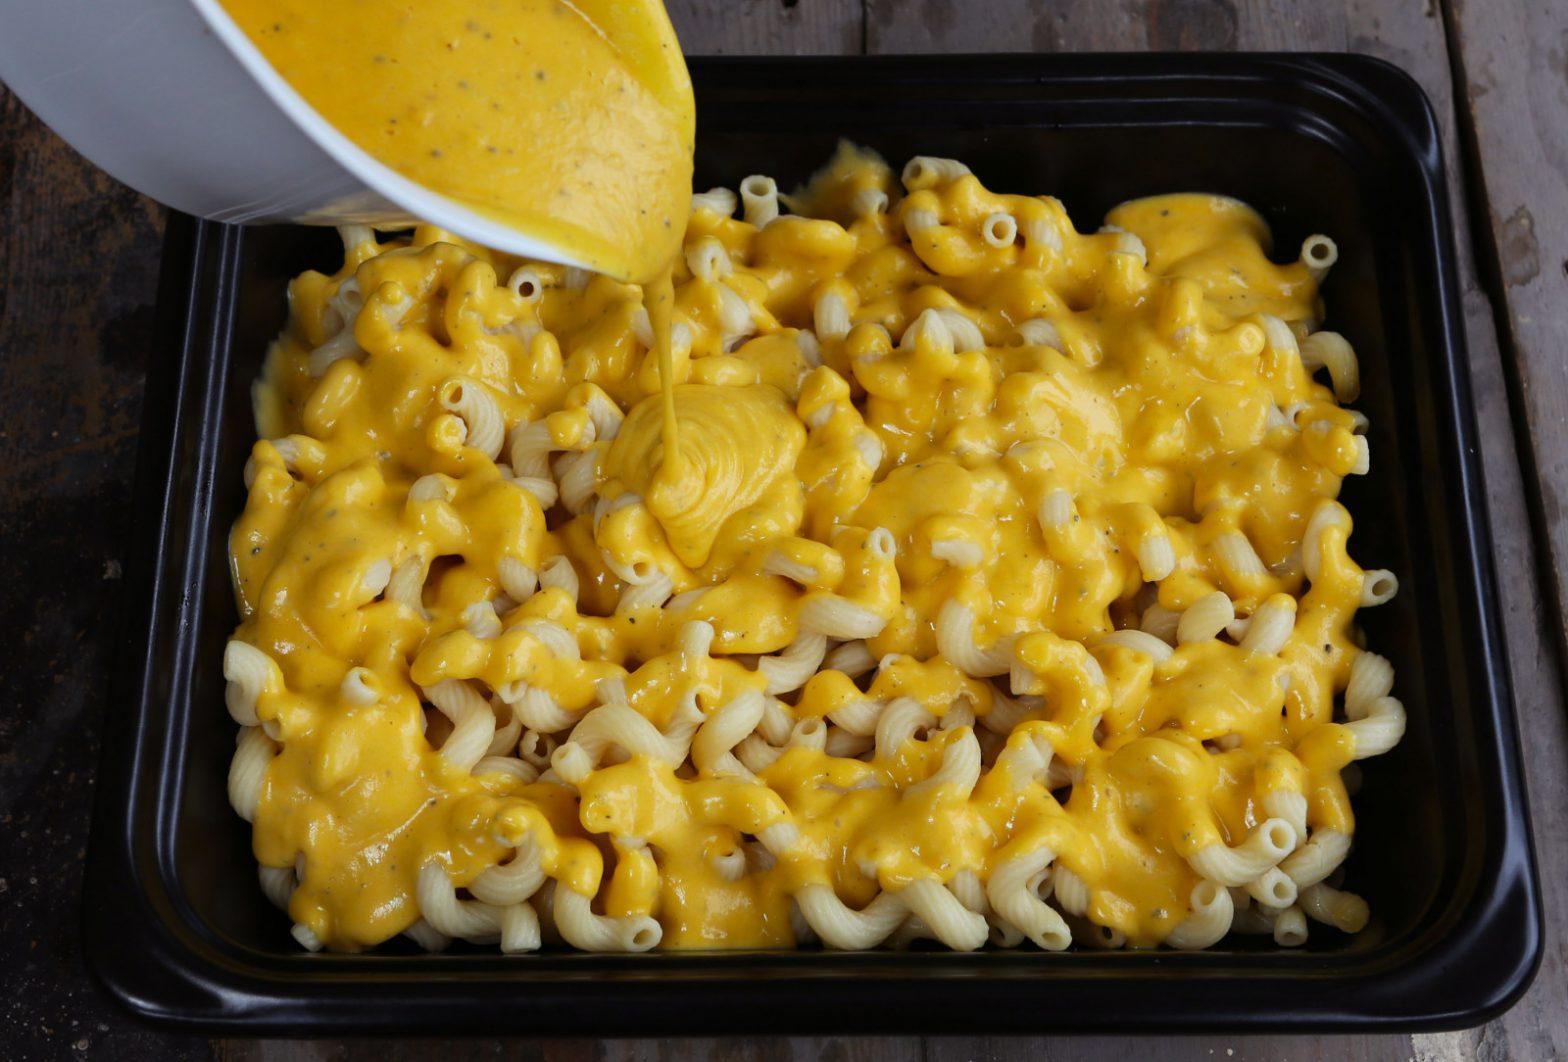 Quick & Healthy Vegan Mac 'n' Cheese